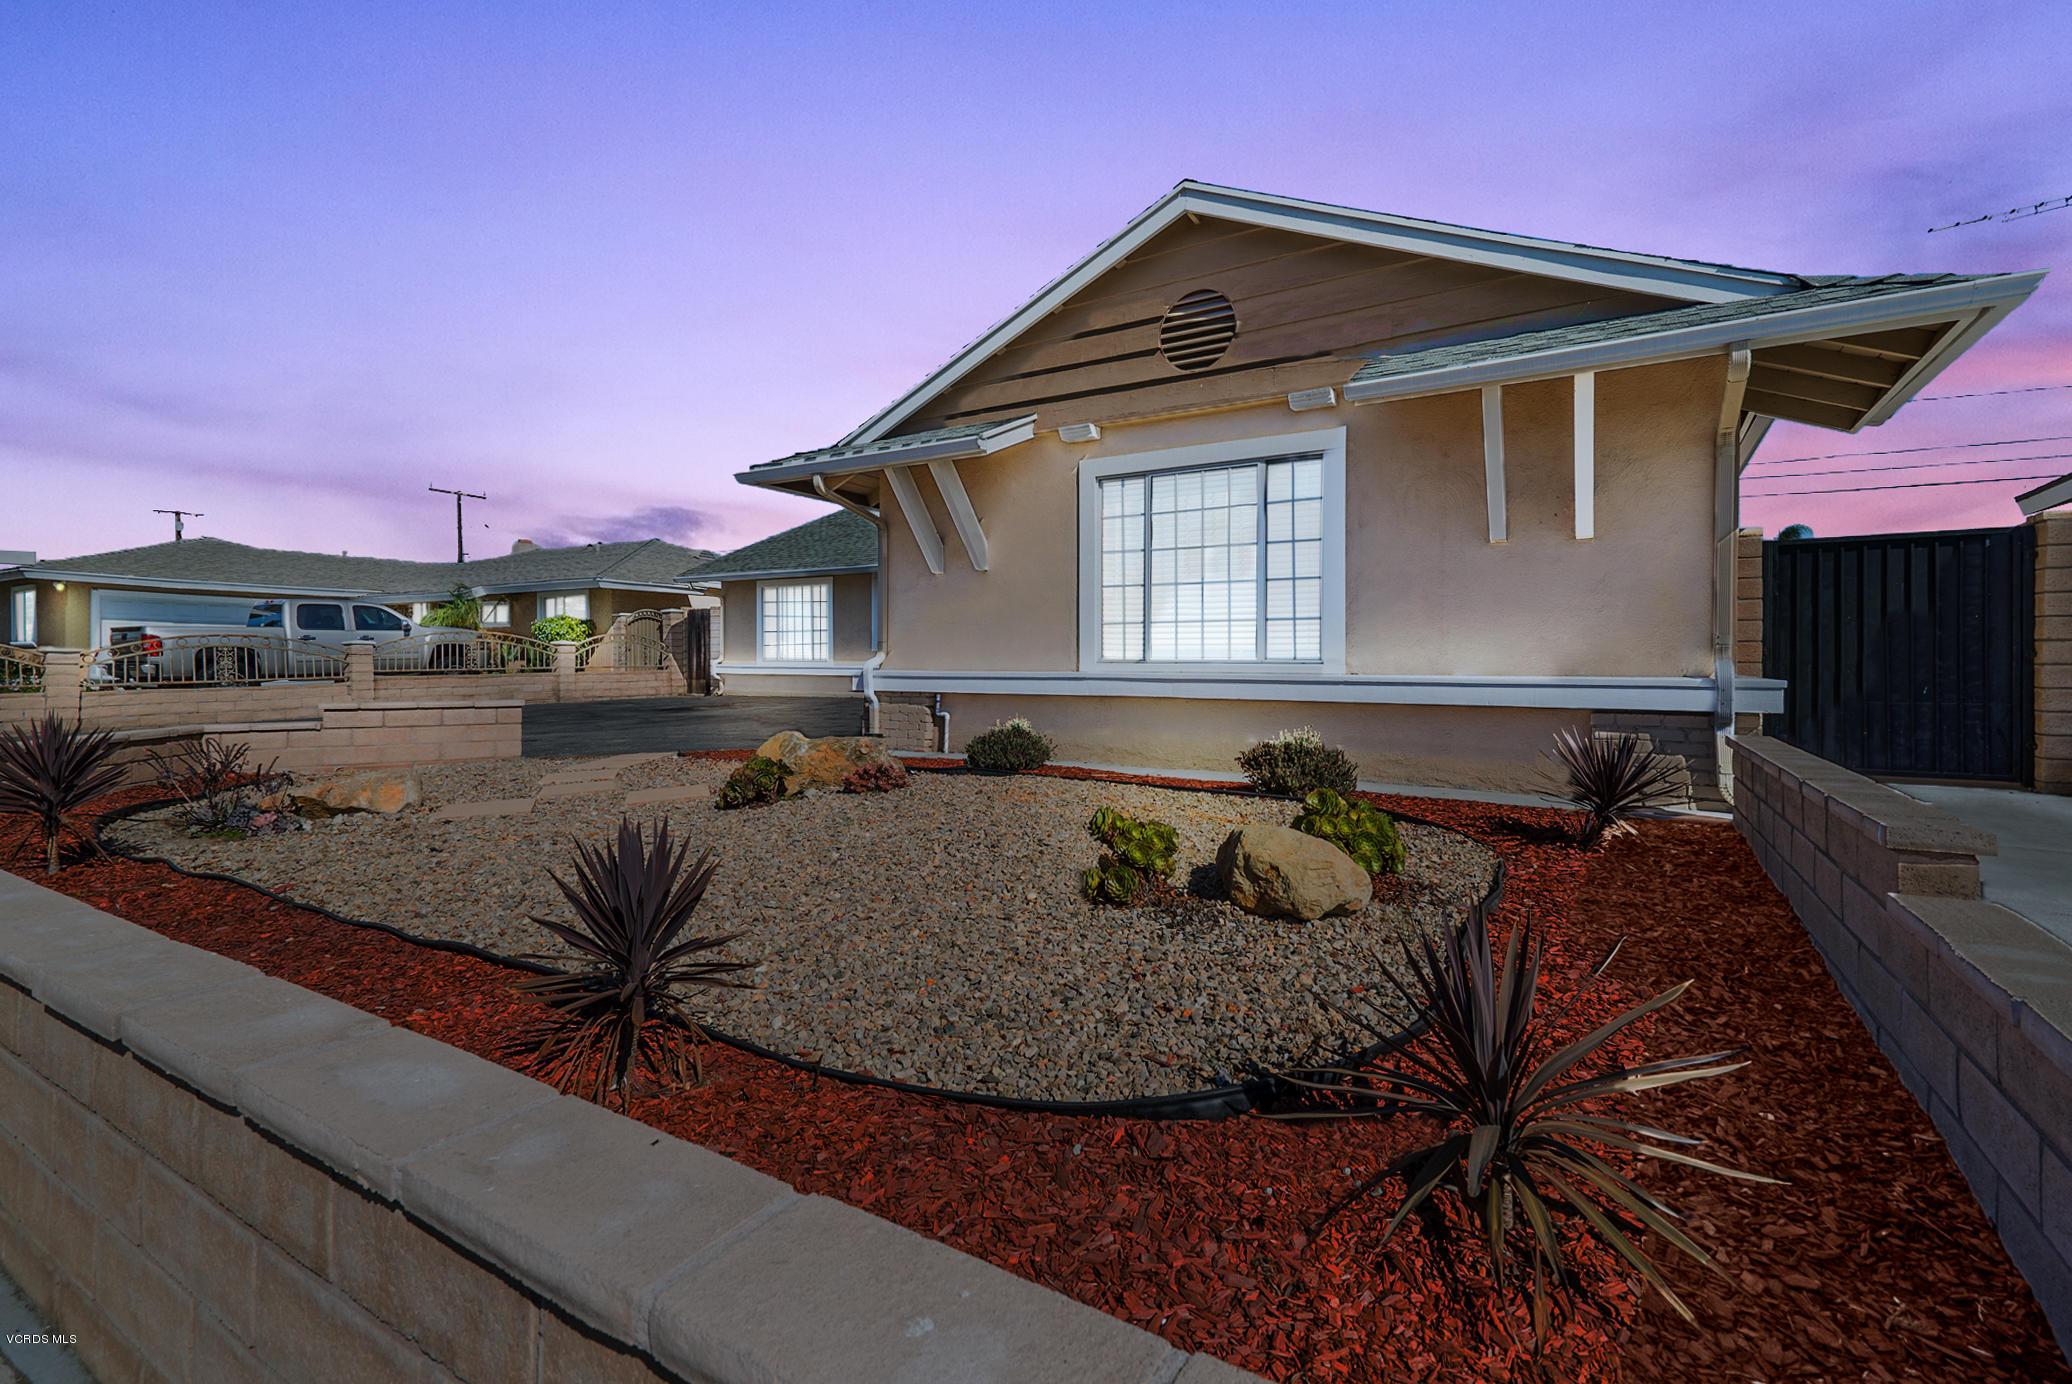 1001 Redwood Street, Oxnard, CA 93033